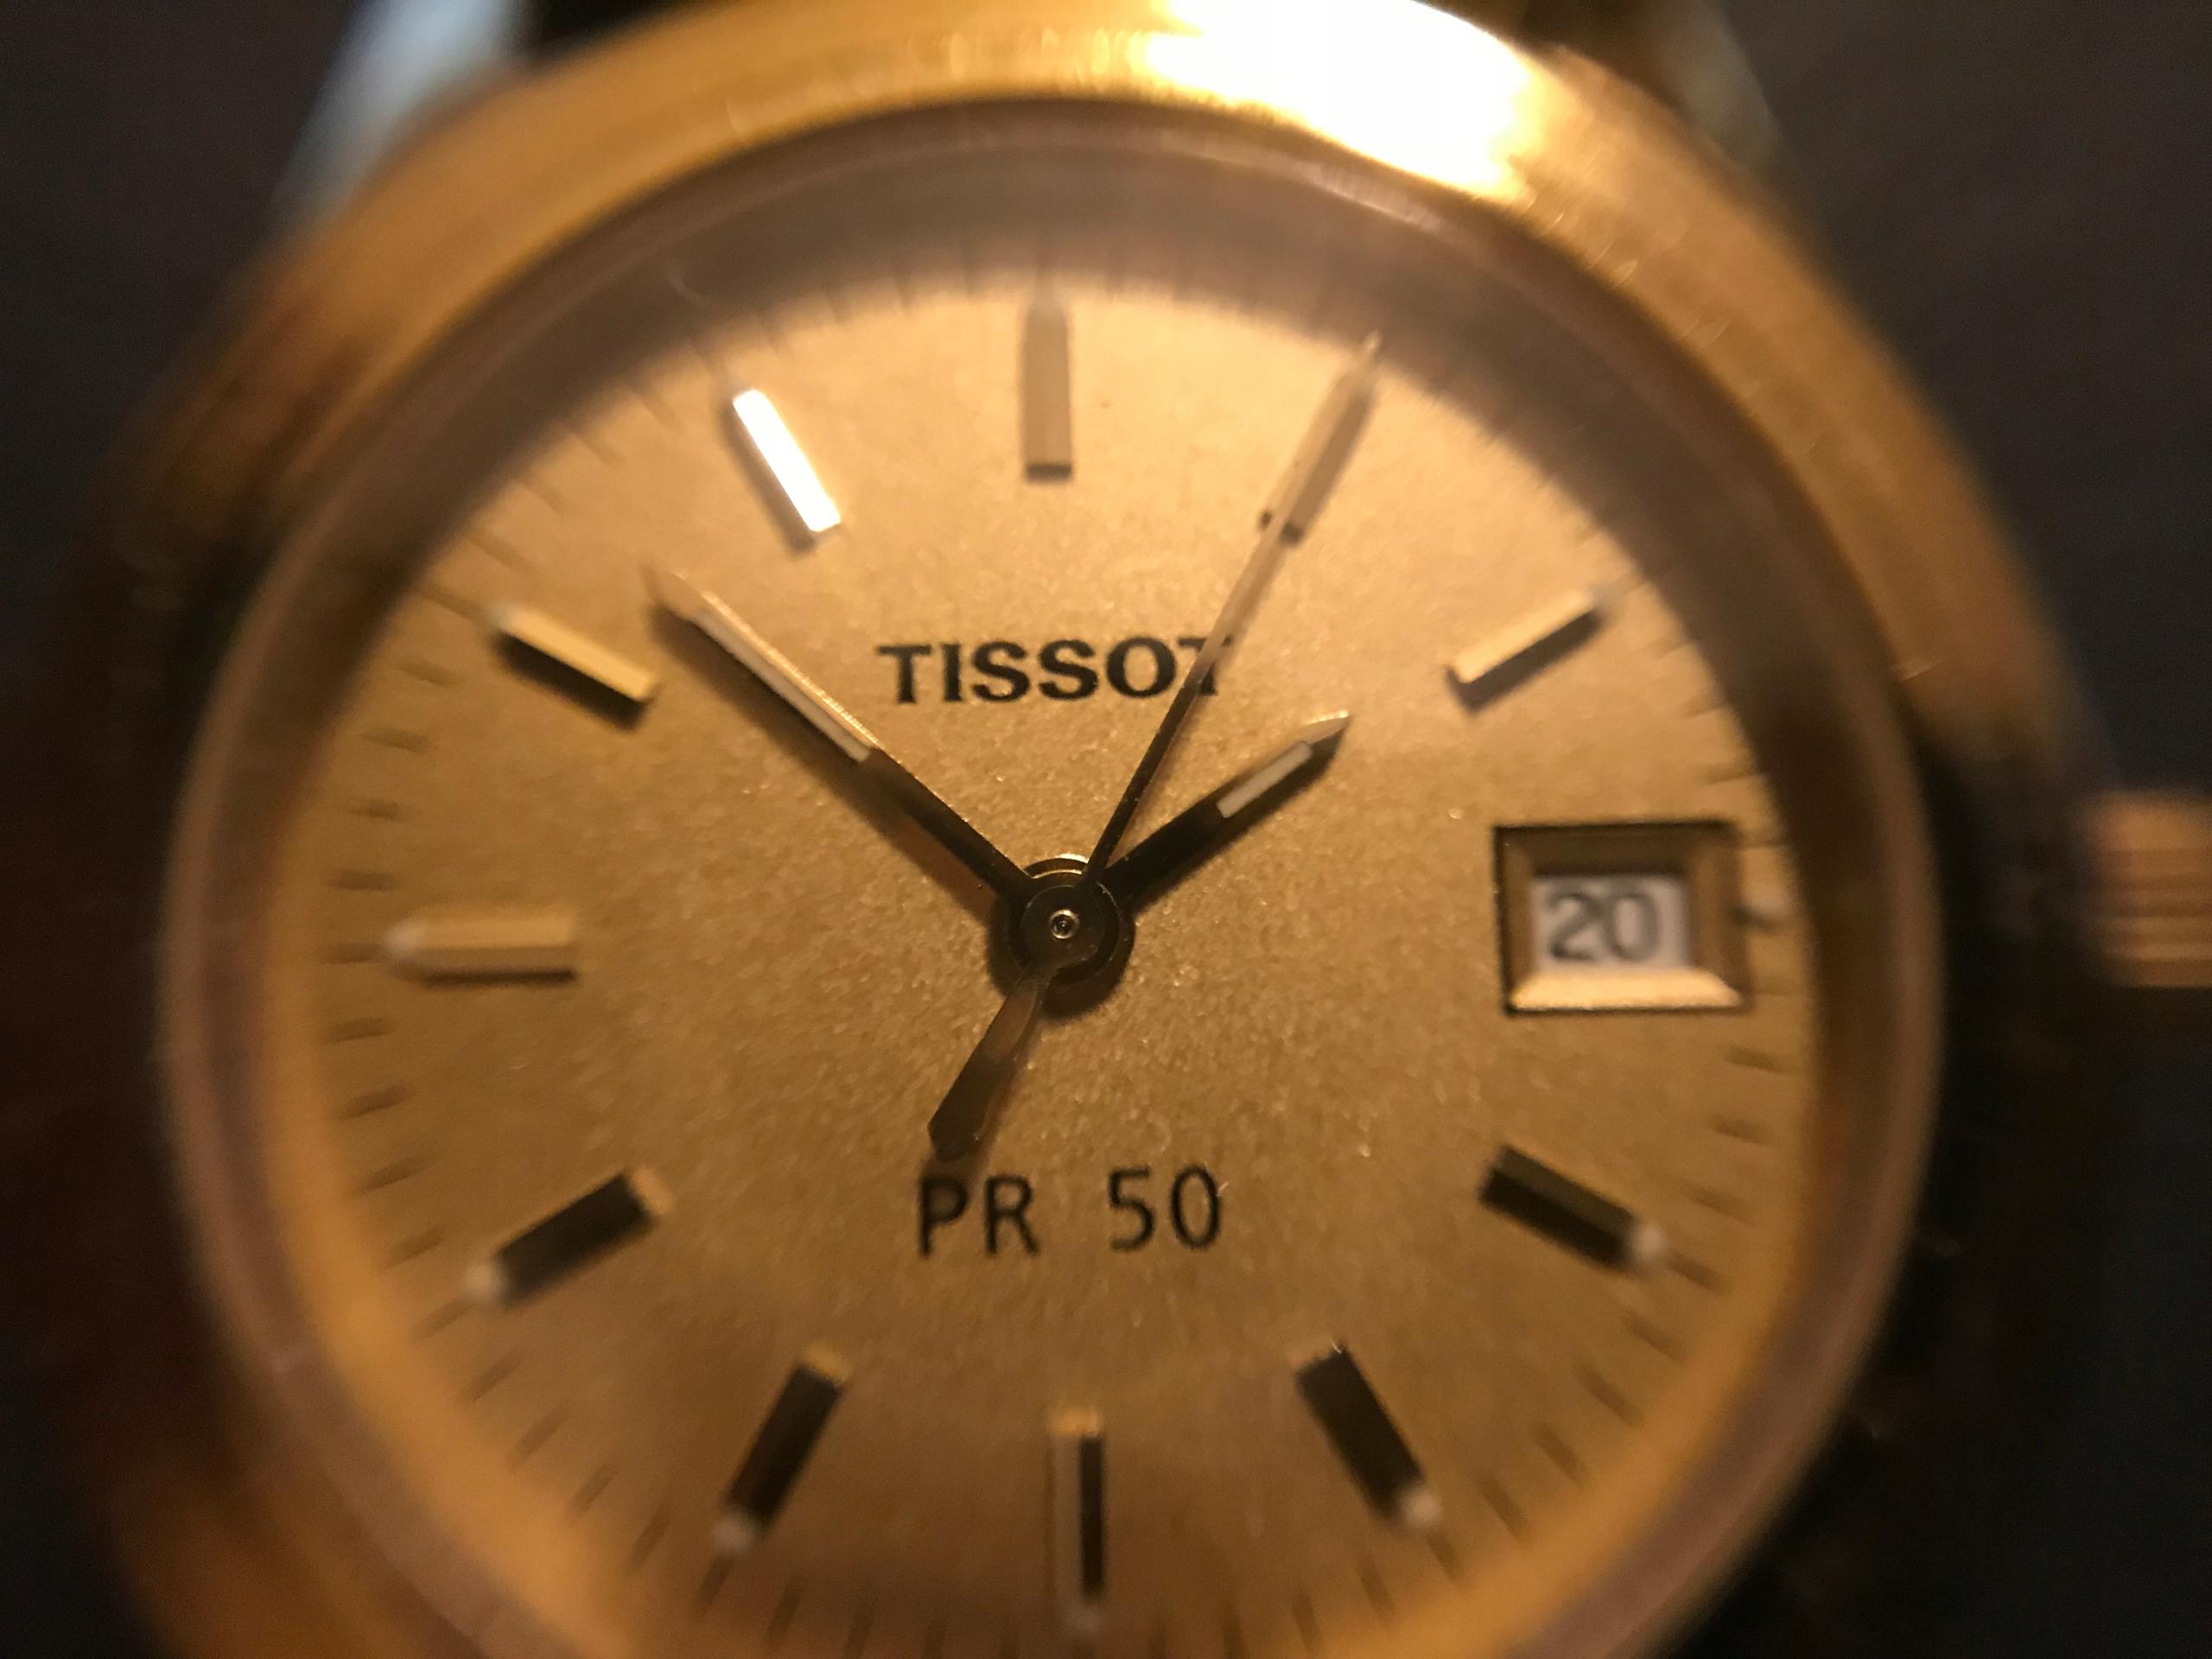 Przepiękny zegarek TISSOT model J134/234K